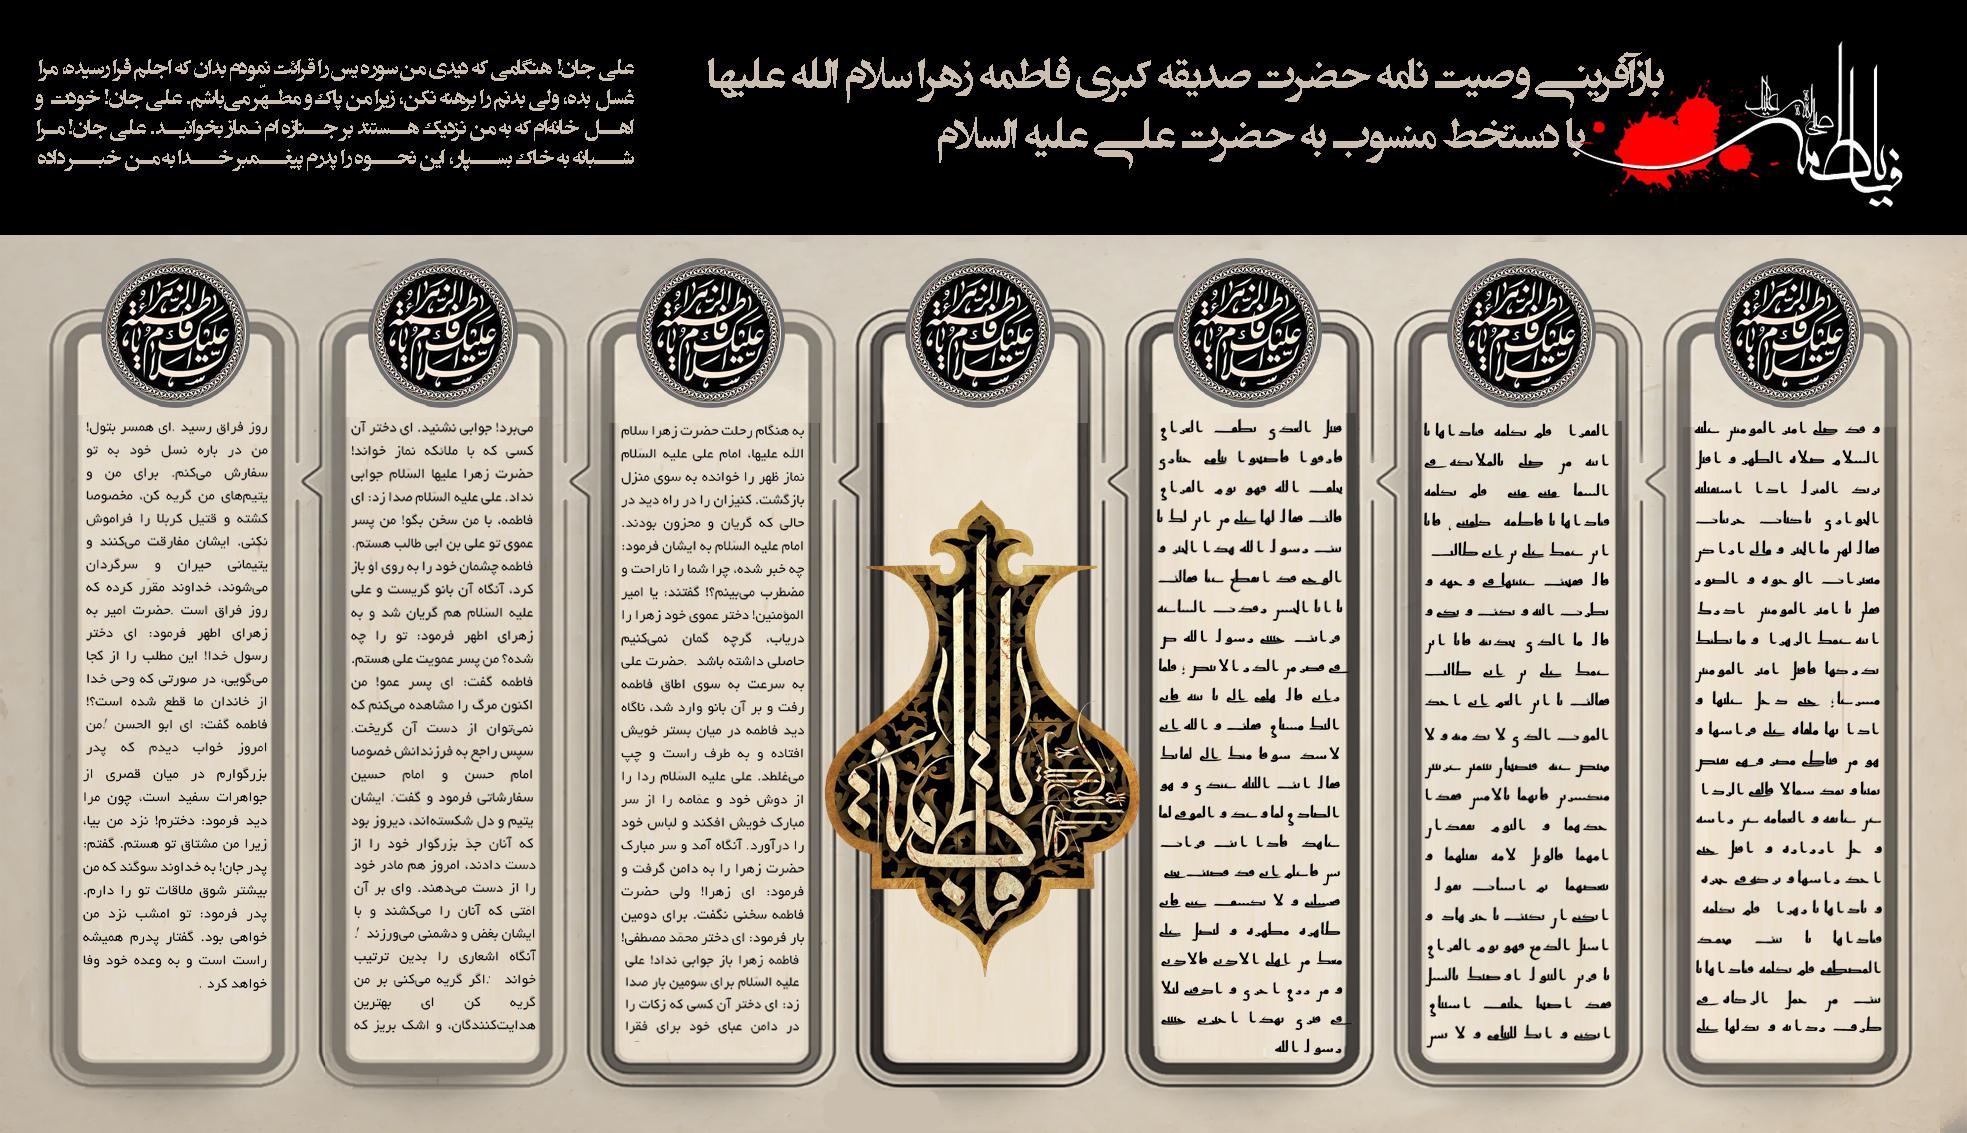 وصیتنامه حضرت زهرا سلام الله علیها به حضرت علی علیه السلام